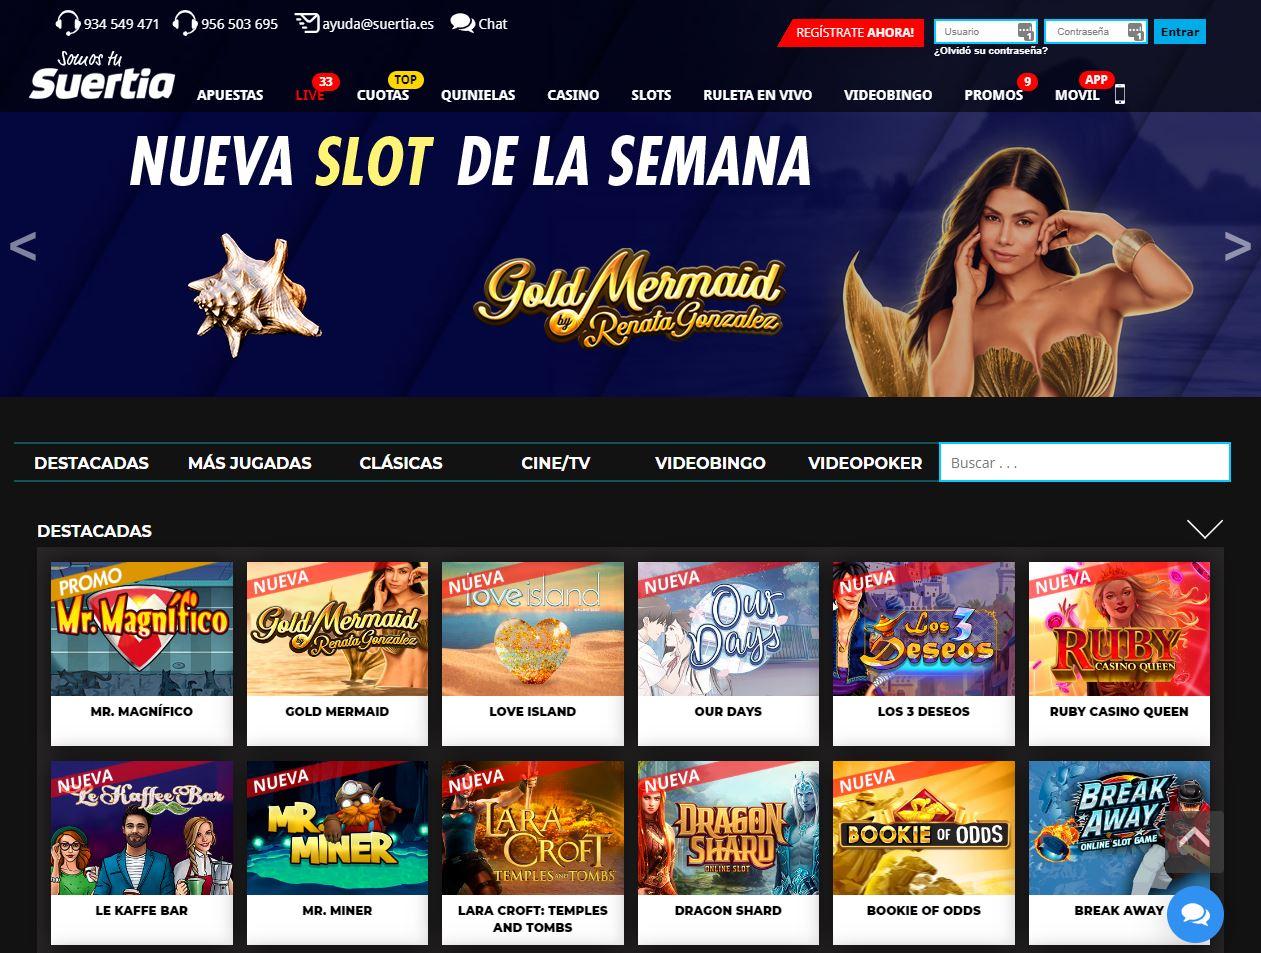 Slots en Suertia Casino